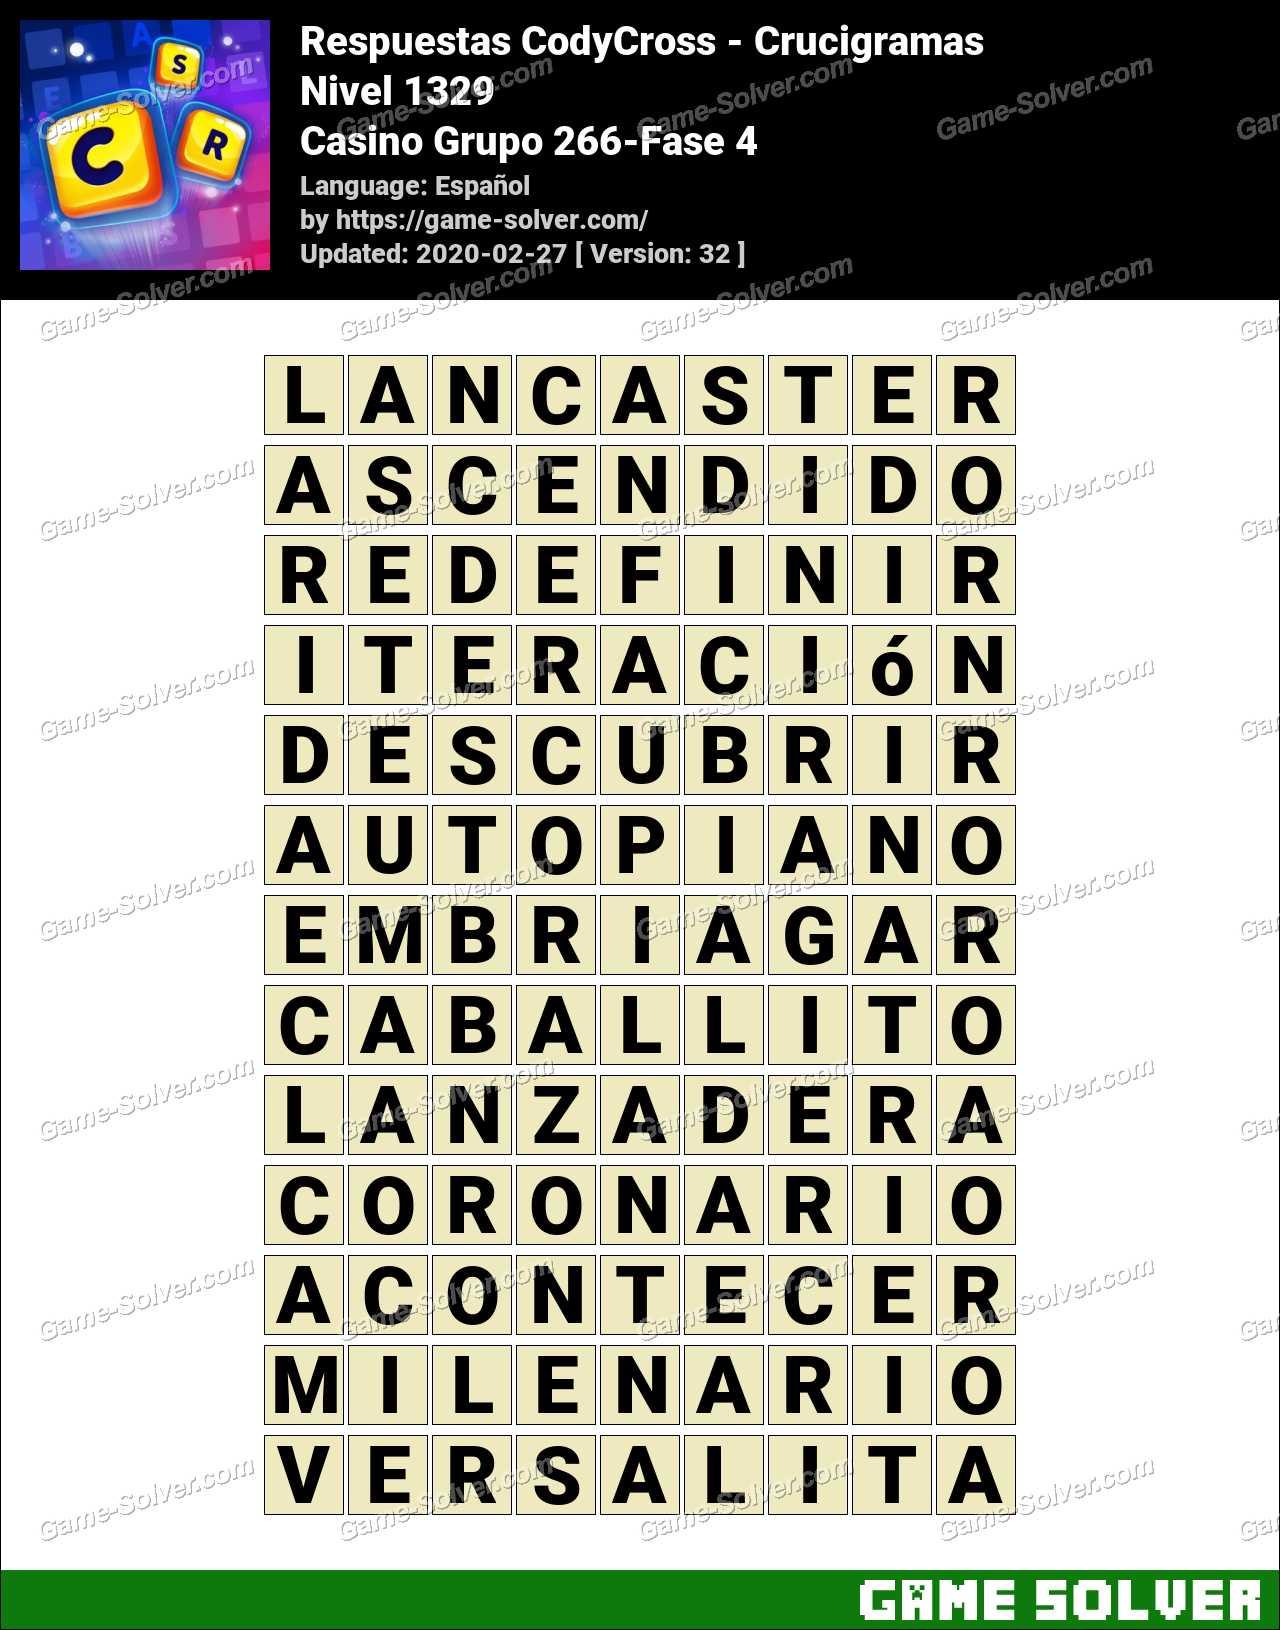 Respuestas CodyCross Casino Grupo 266-Fase 4